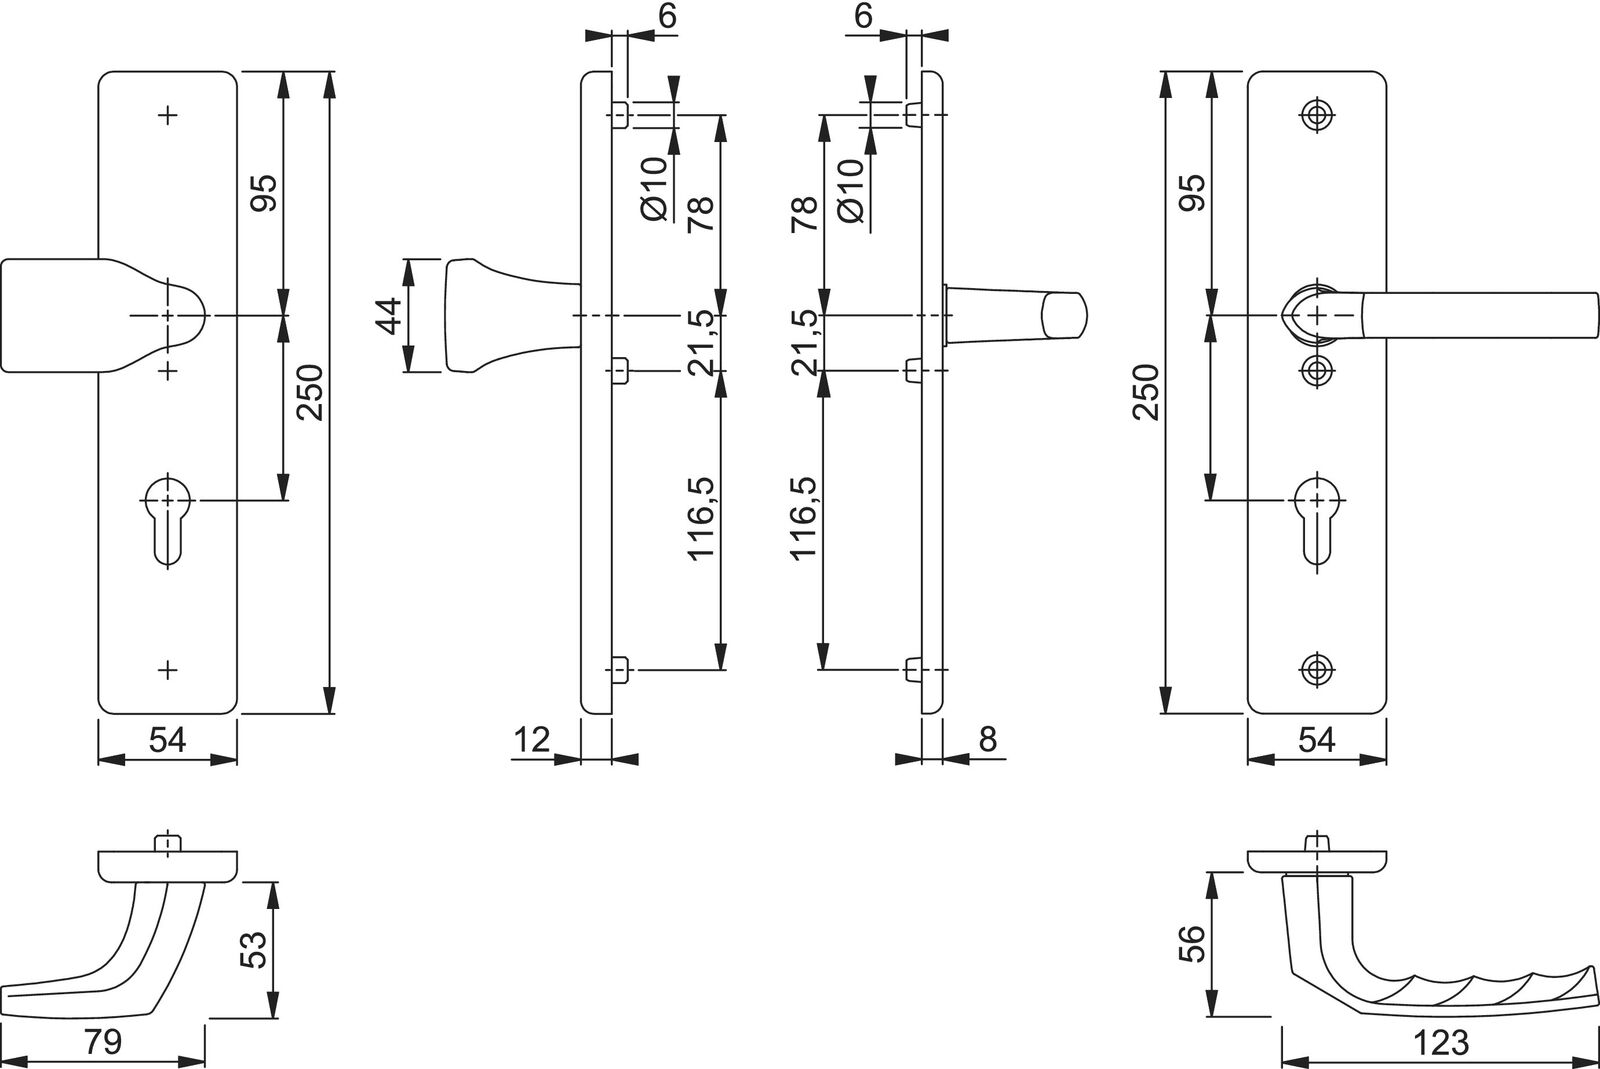 2440 Hoppe Sicherheits-Wechsel-Garnitur 78G 2221A 3841139 1117 F4 PZ..